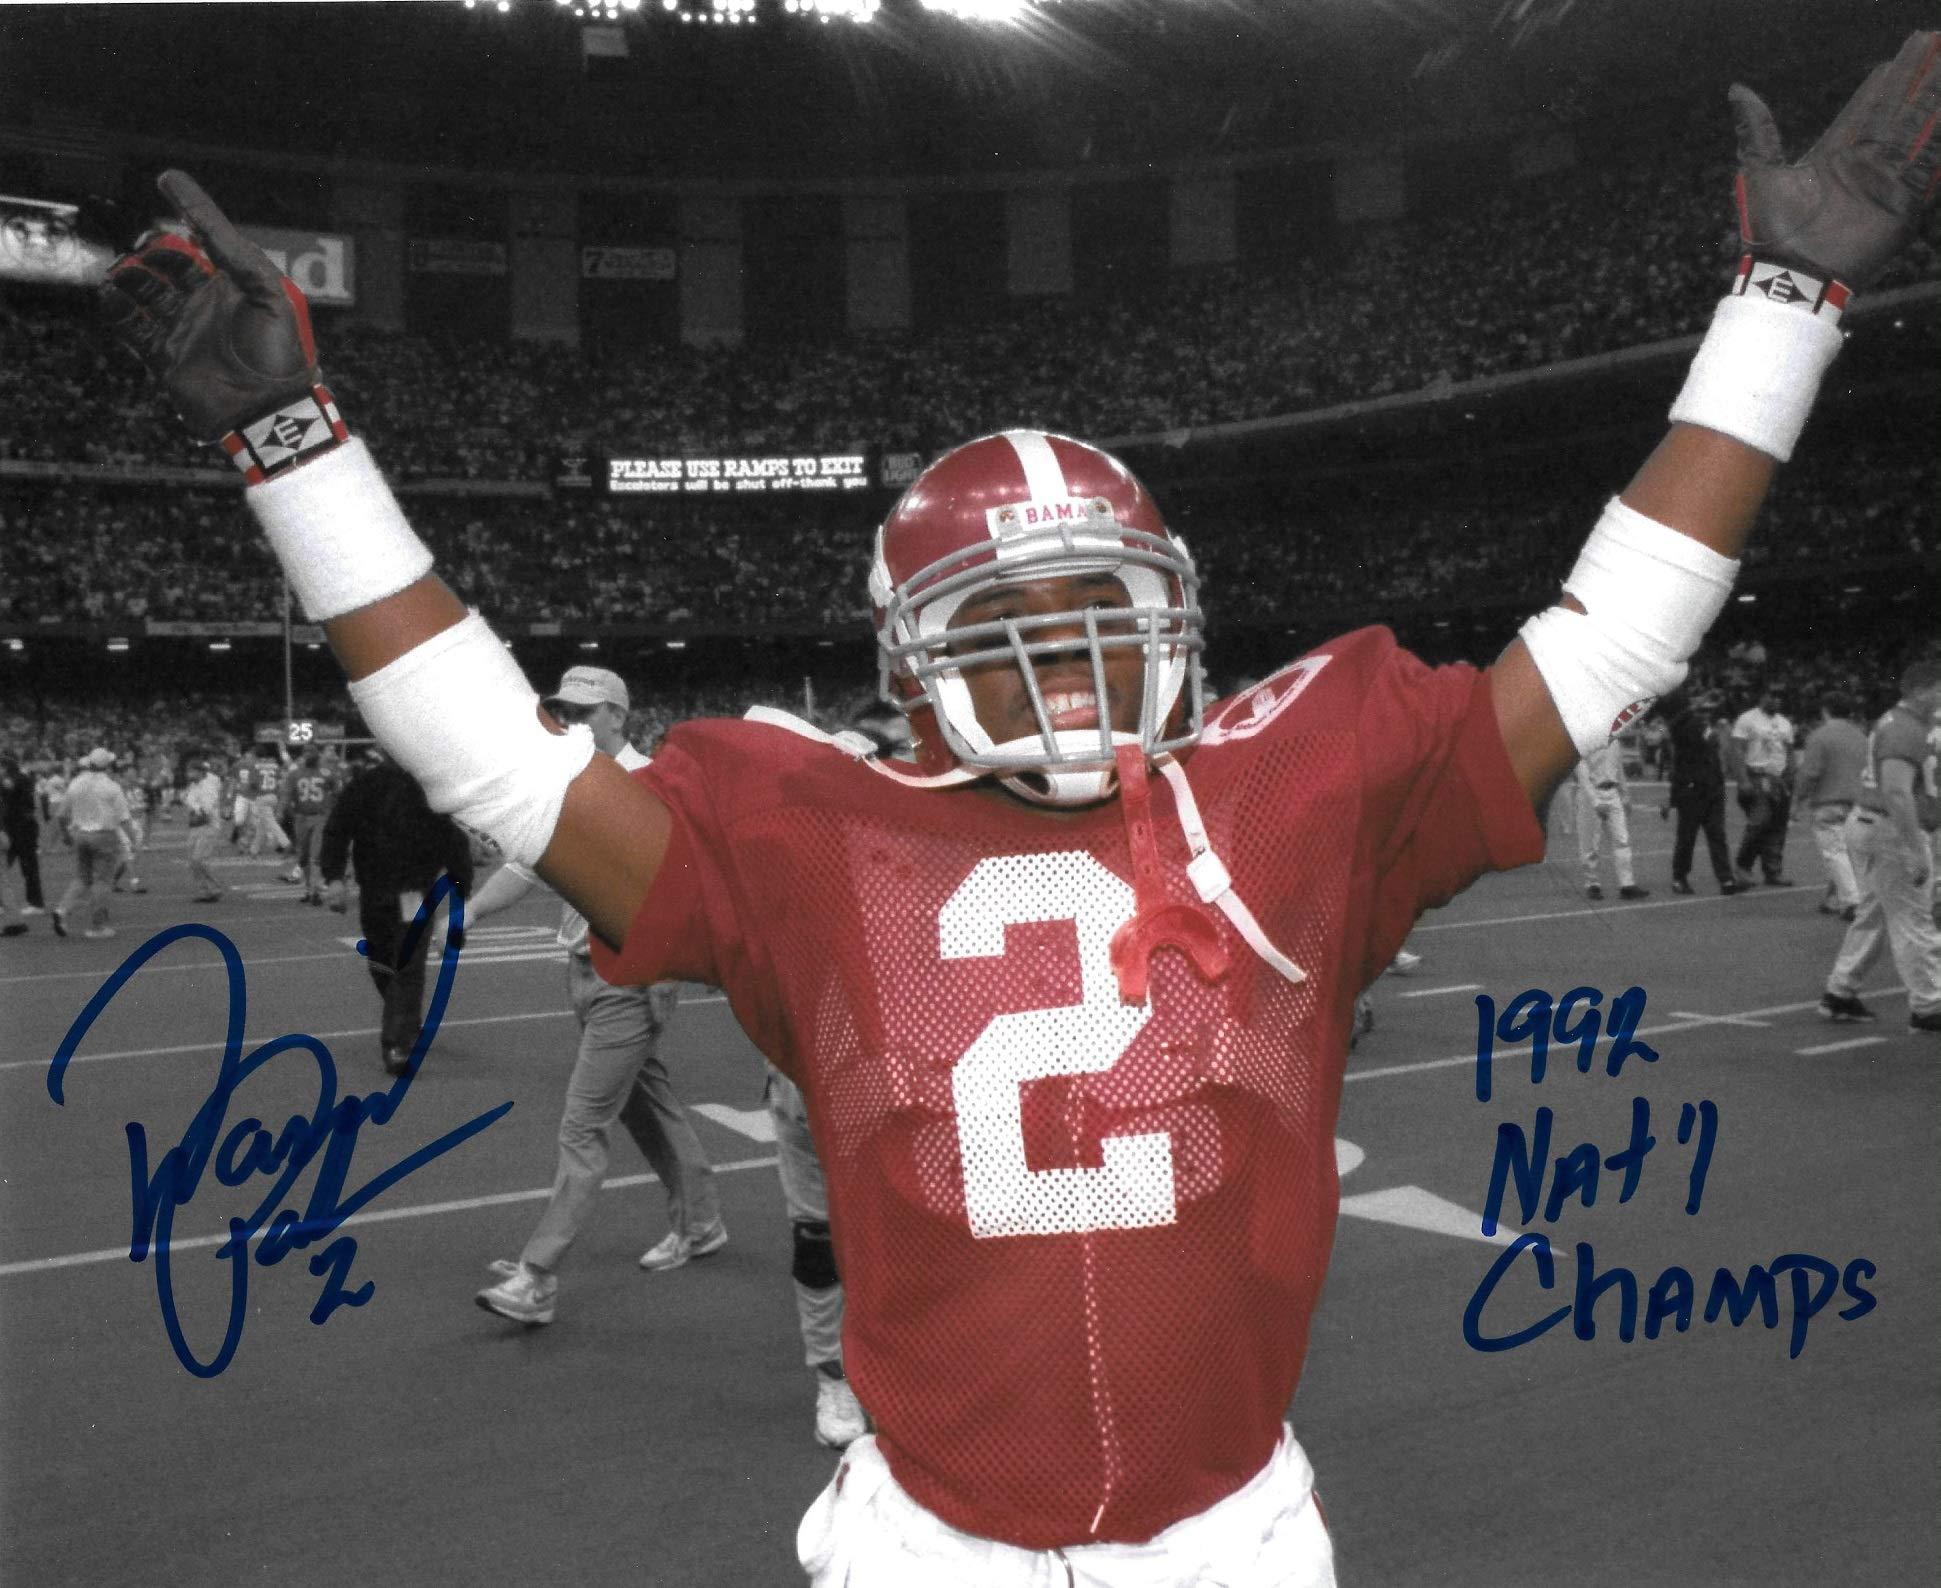 David Palmer Signed Autographed Auto Alabama Crimson Tide 8x10 Spotlight Photo w/92 Natl Champs Proof